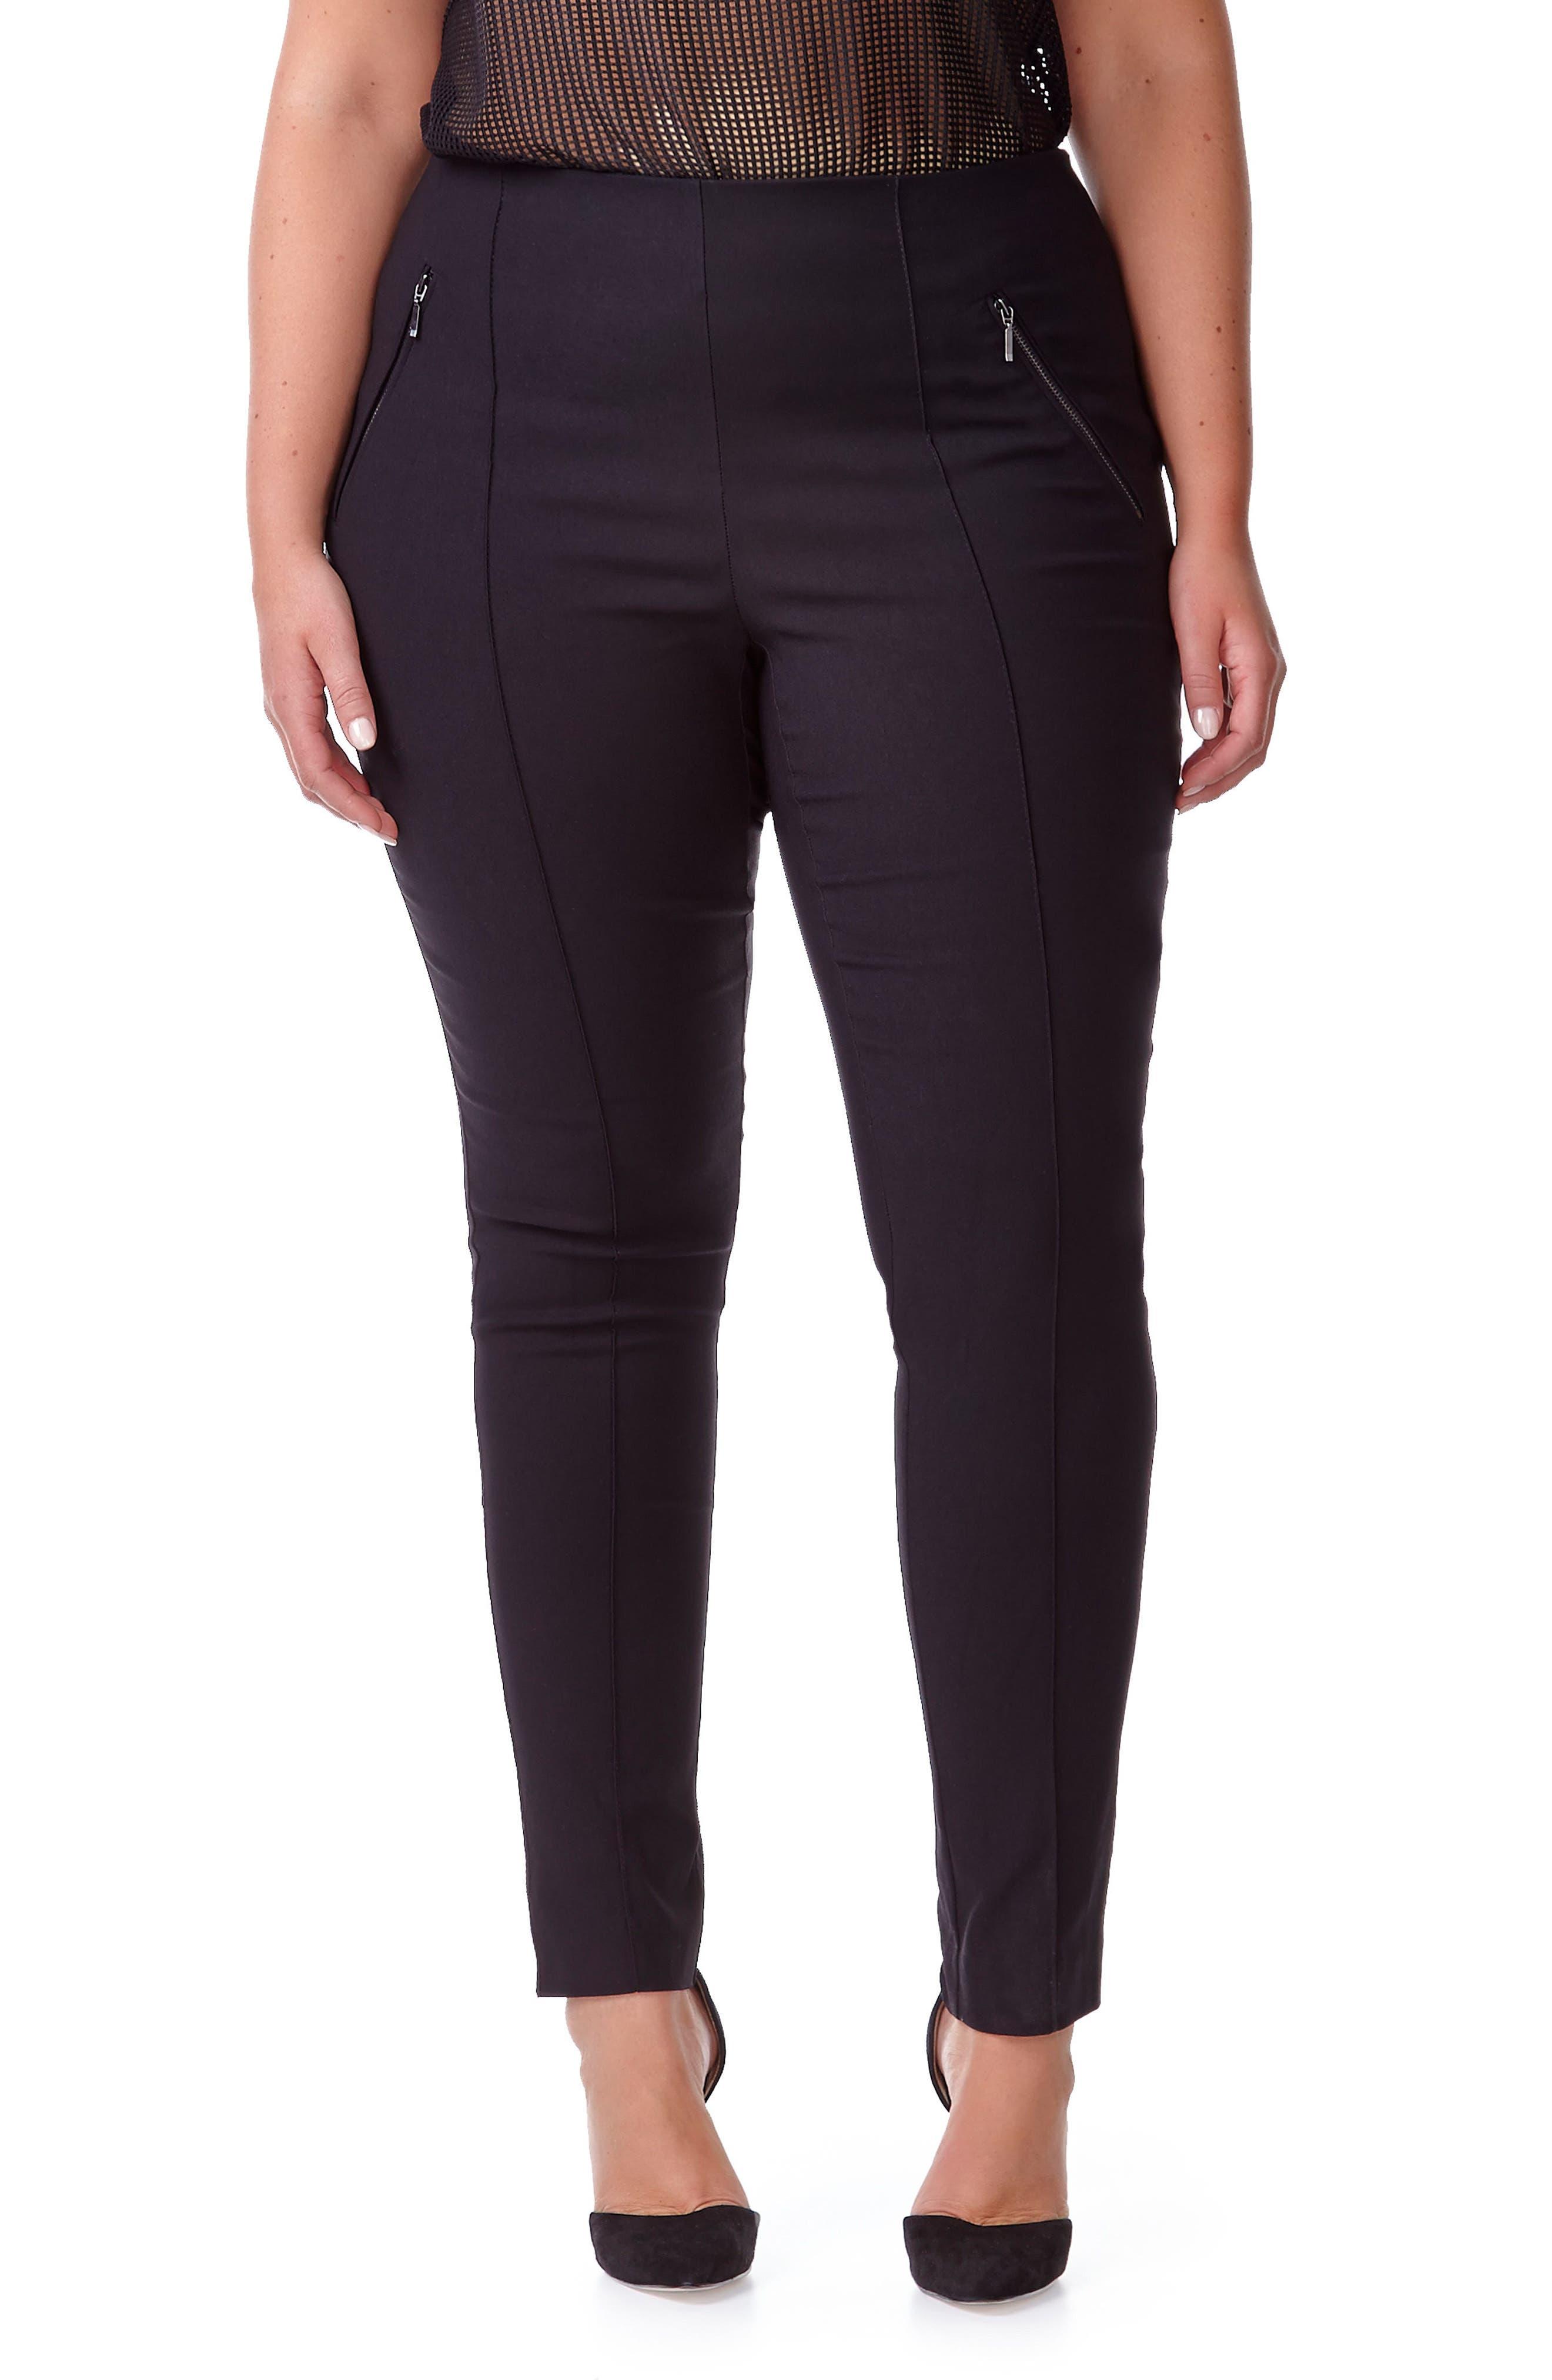 MICHEL STUDIO,                             Alexa Ankle Pants,                             Main thumbnail 1, color,                             BLACK